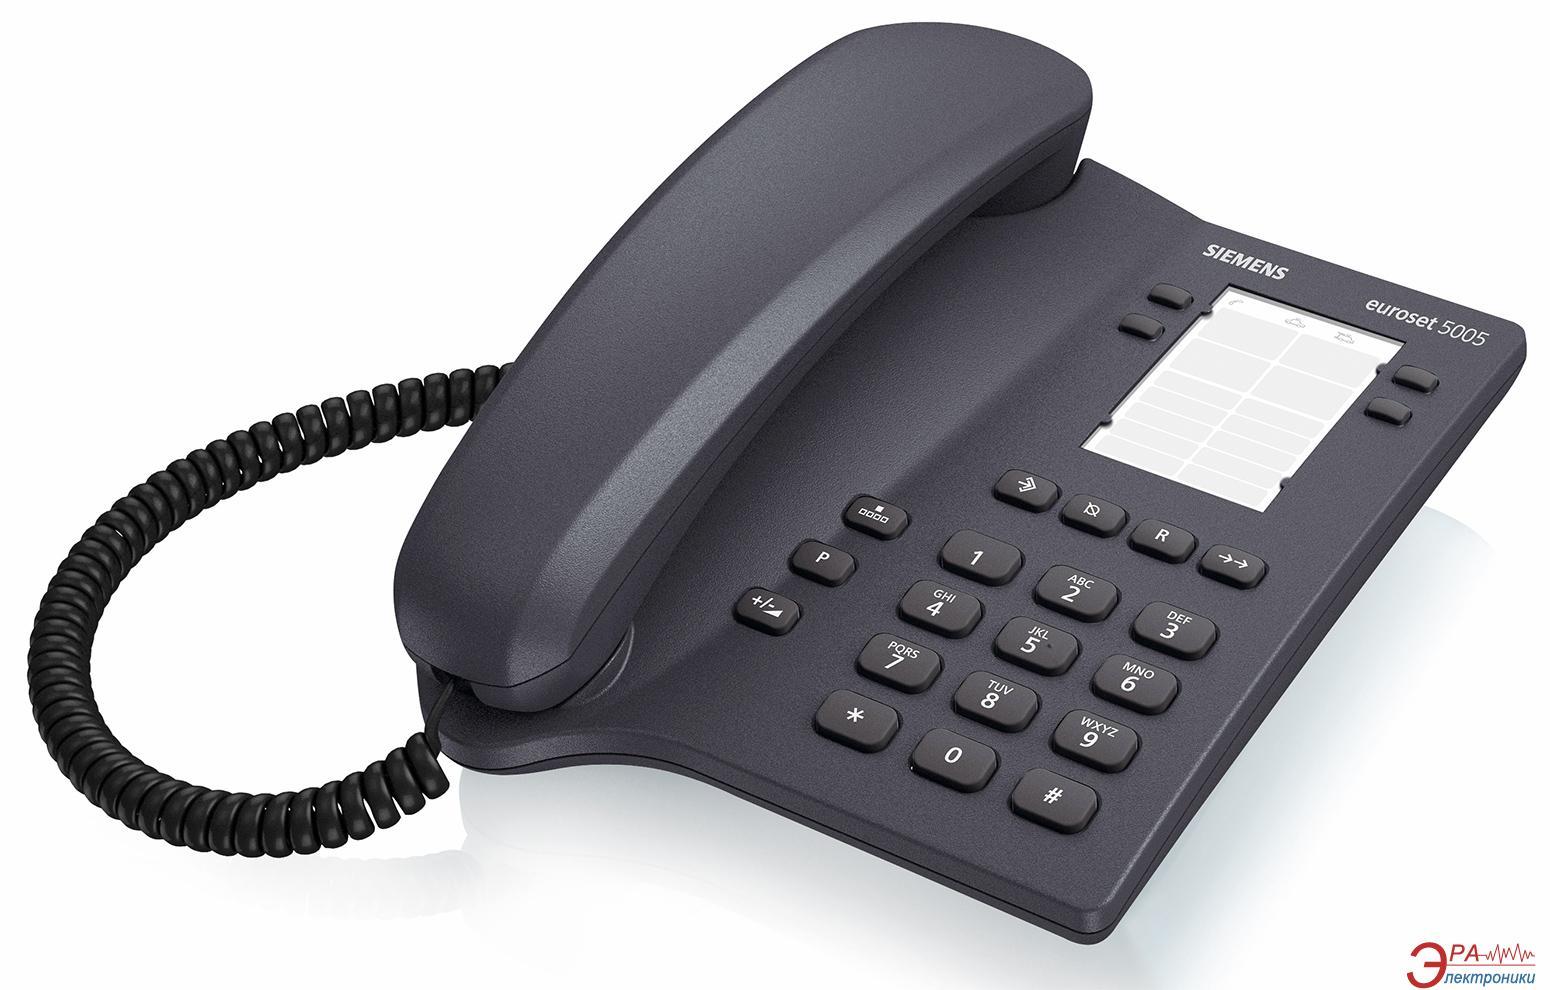 схема телефона siemens euroset 5020